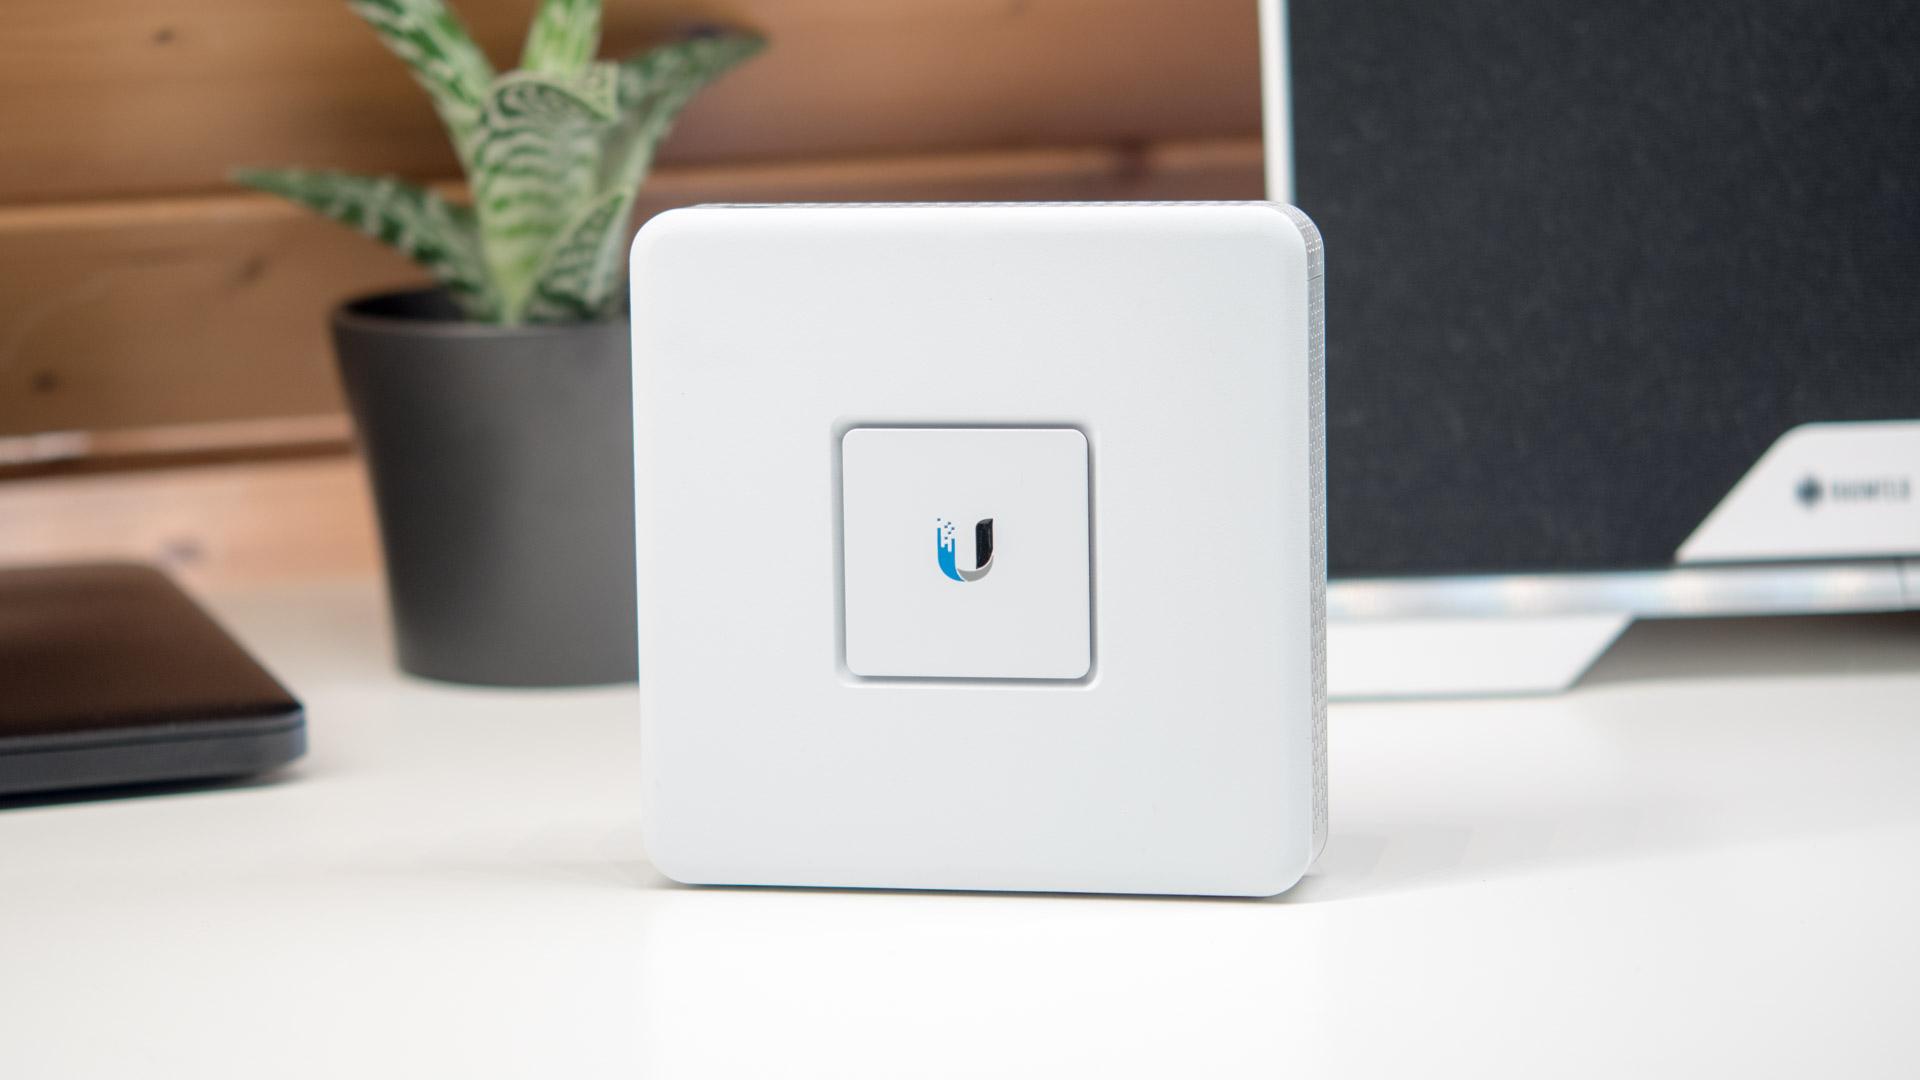 Das Ubiquiti UniFi Security Gateway im Test, die volle